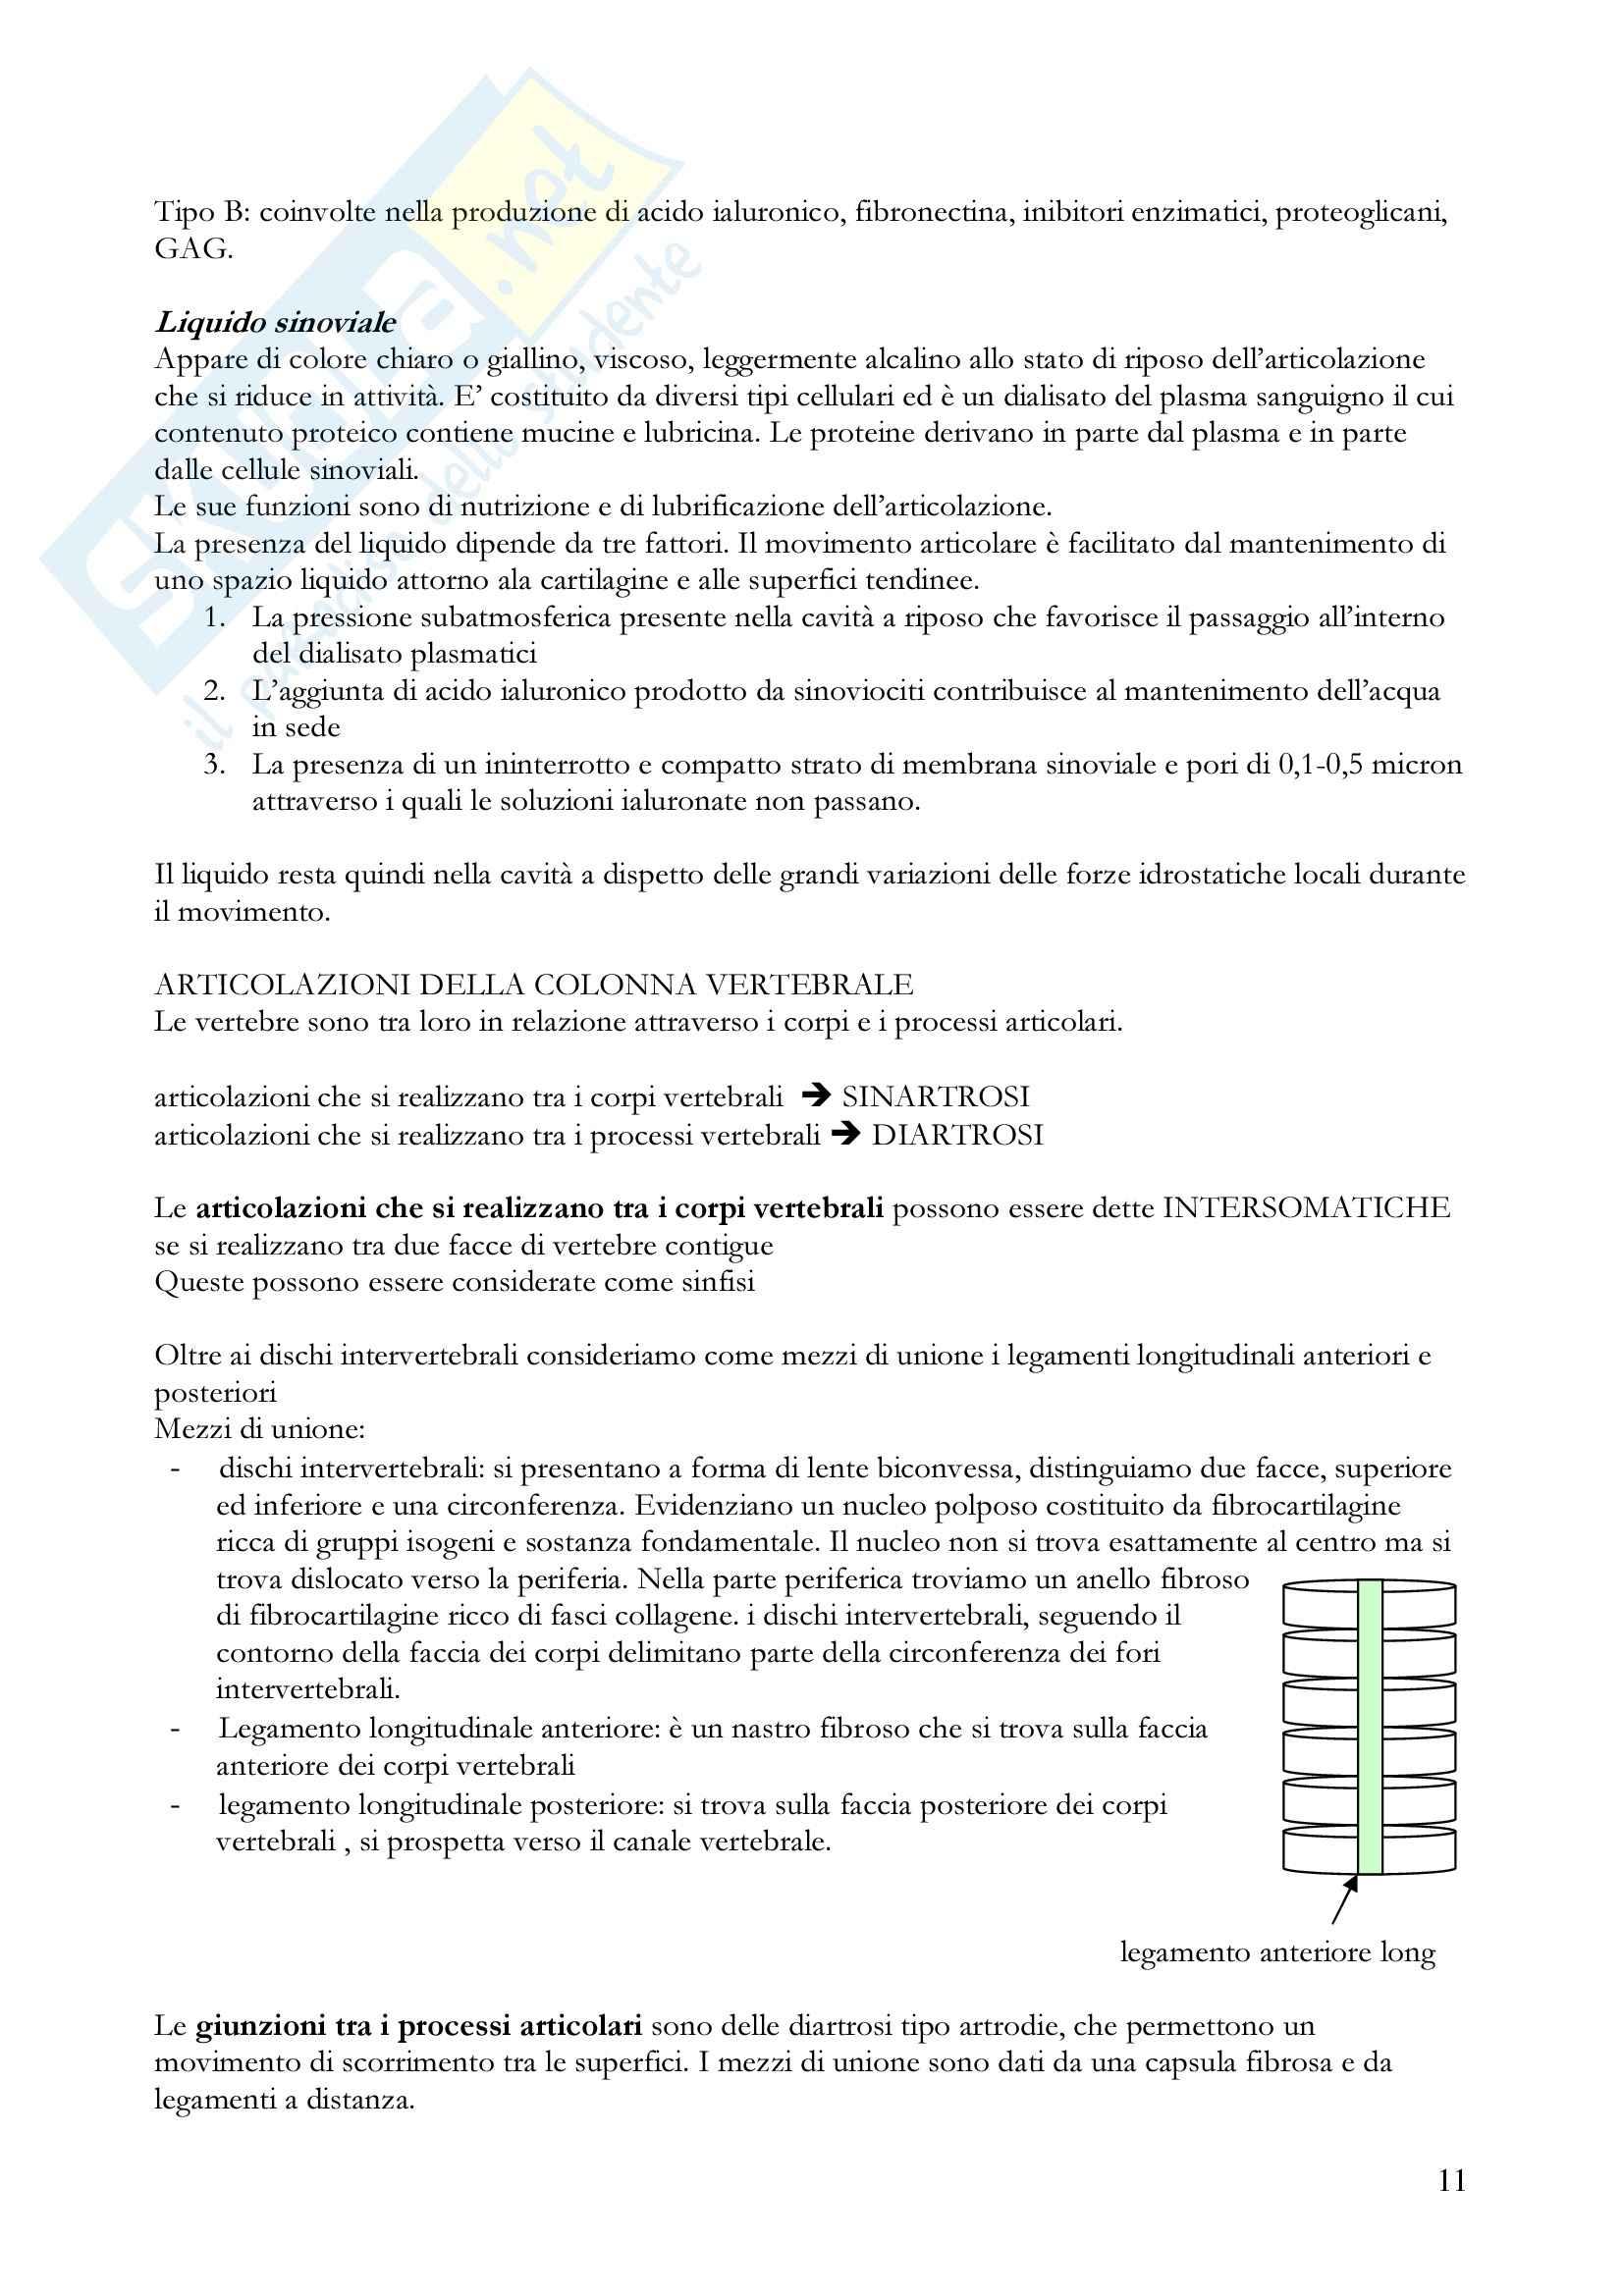 Anatomia umana - apparato locomotore Pag. 11